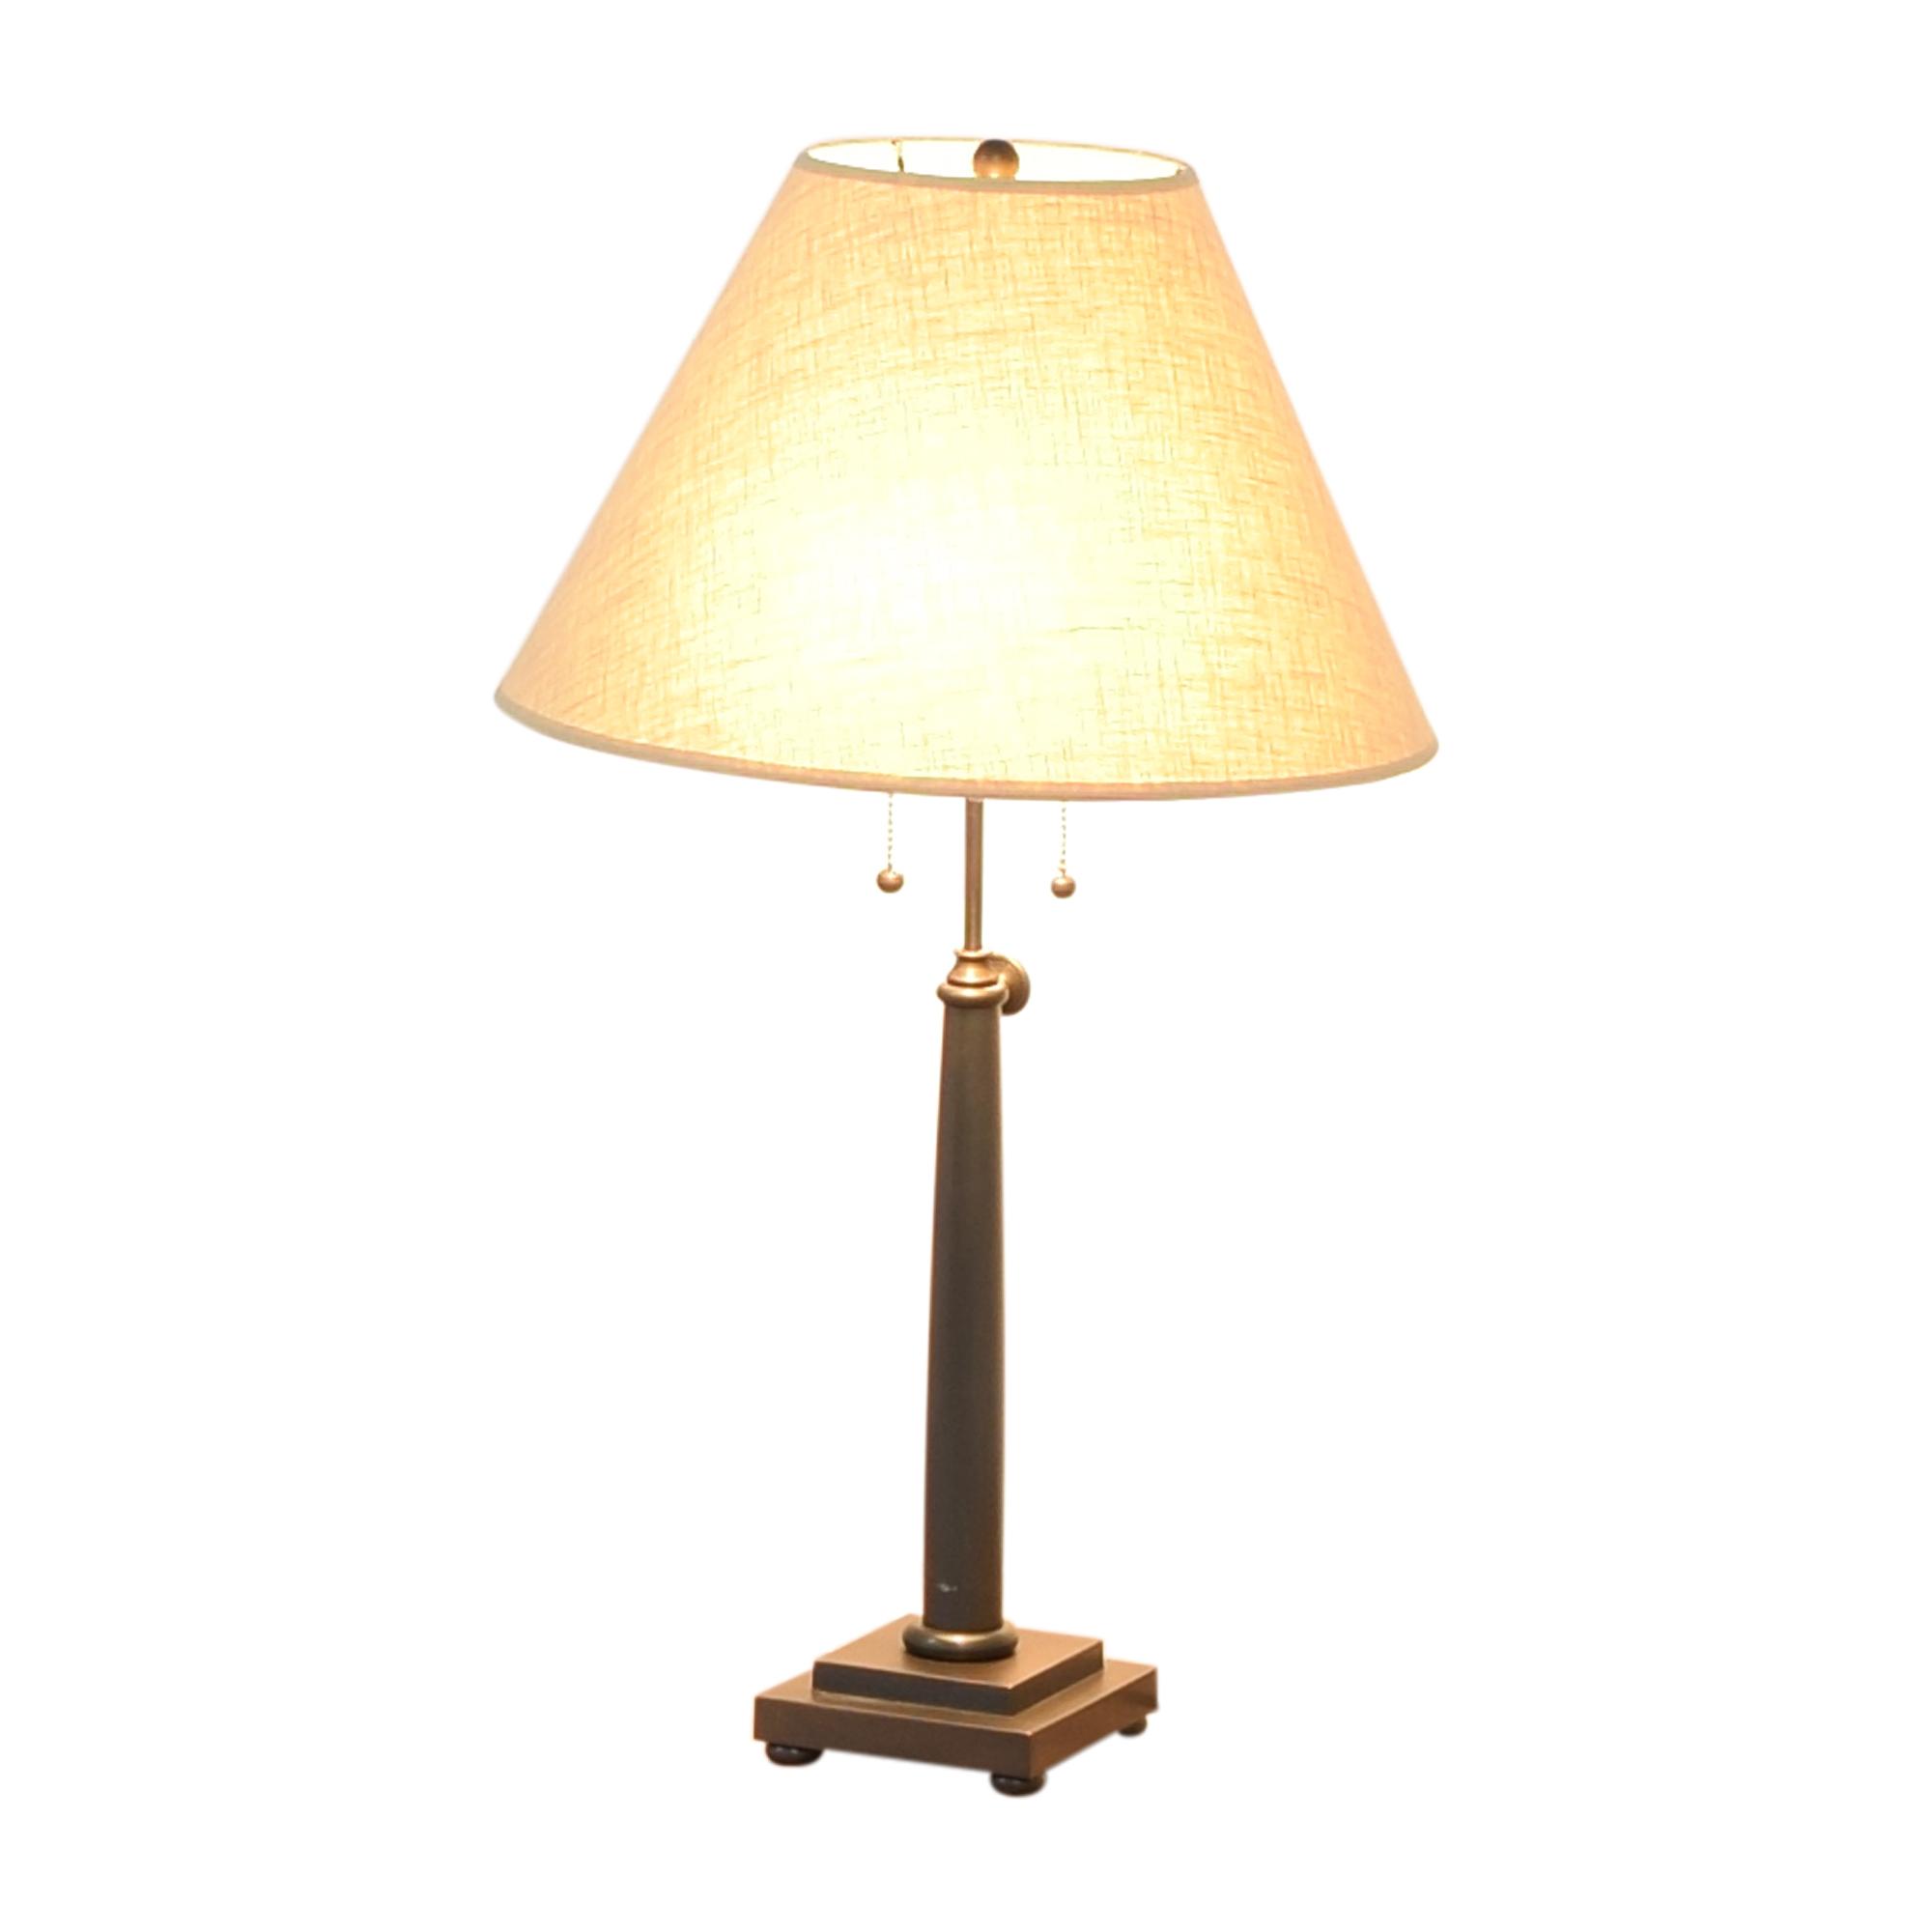 Pottery Barn Pottery Barn Adjustable Table Lamp nj